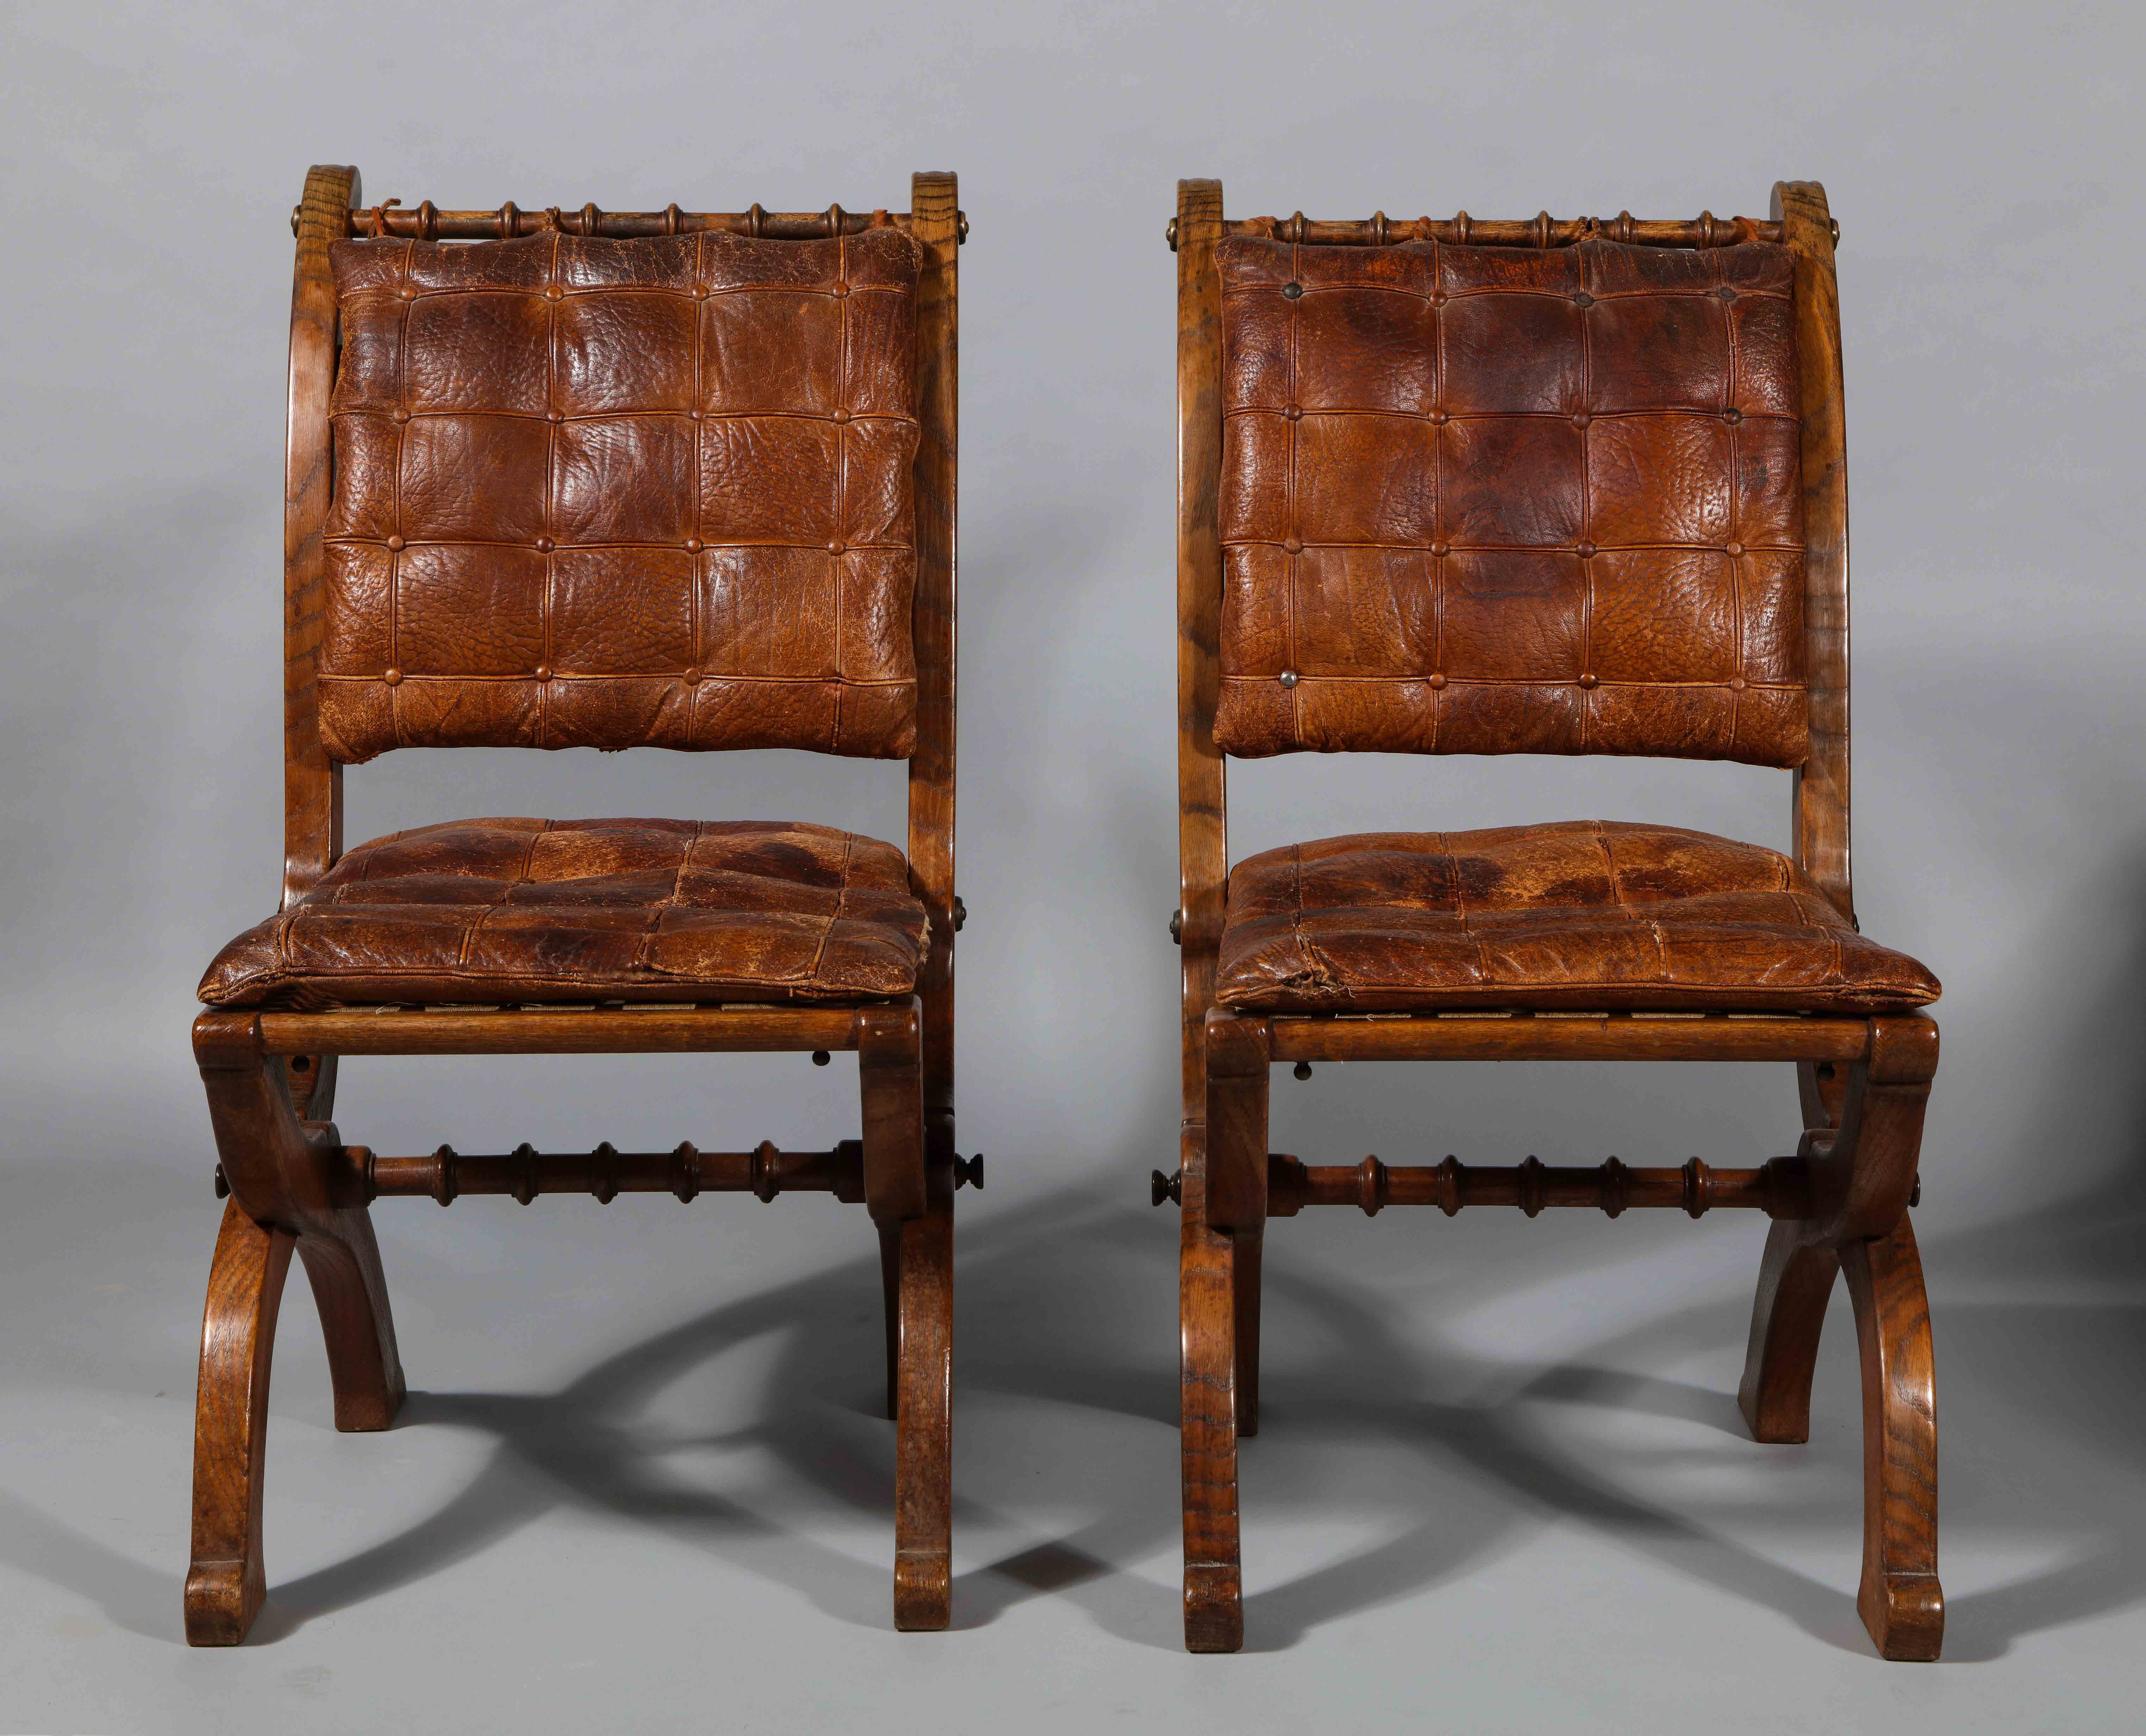 Genial Folding Chairs 4